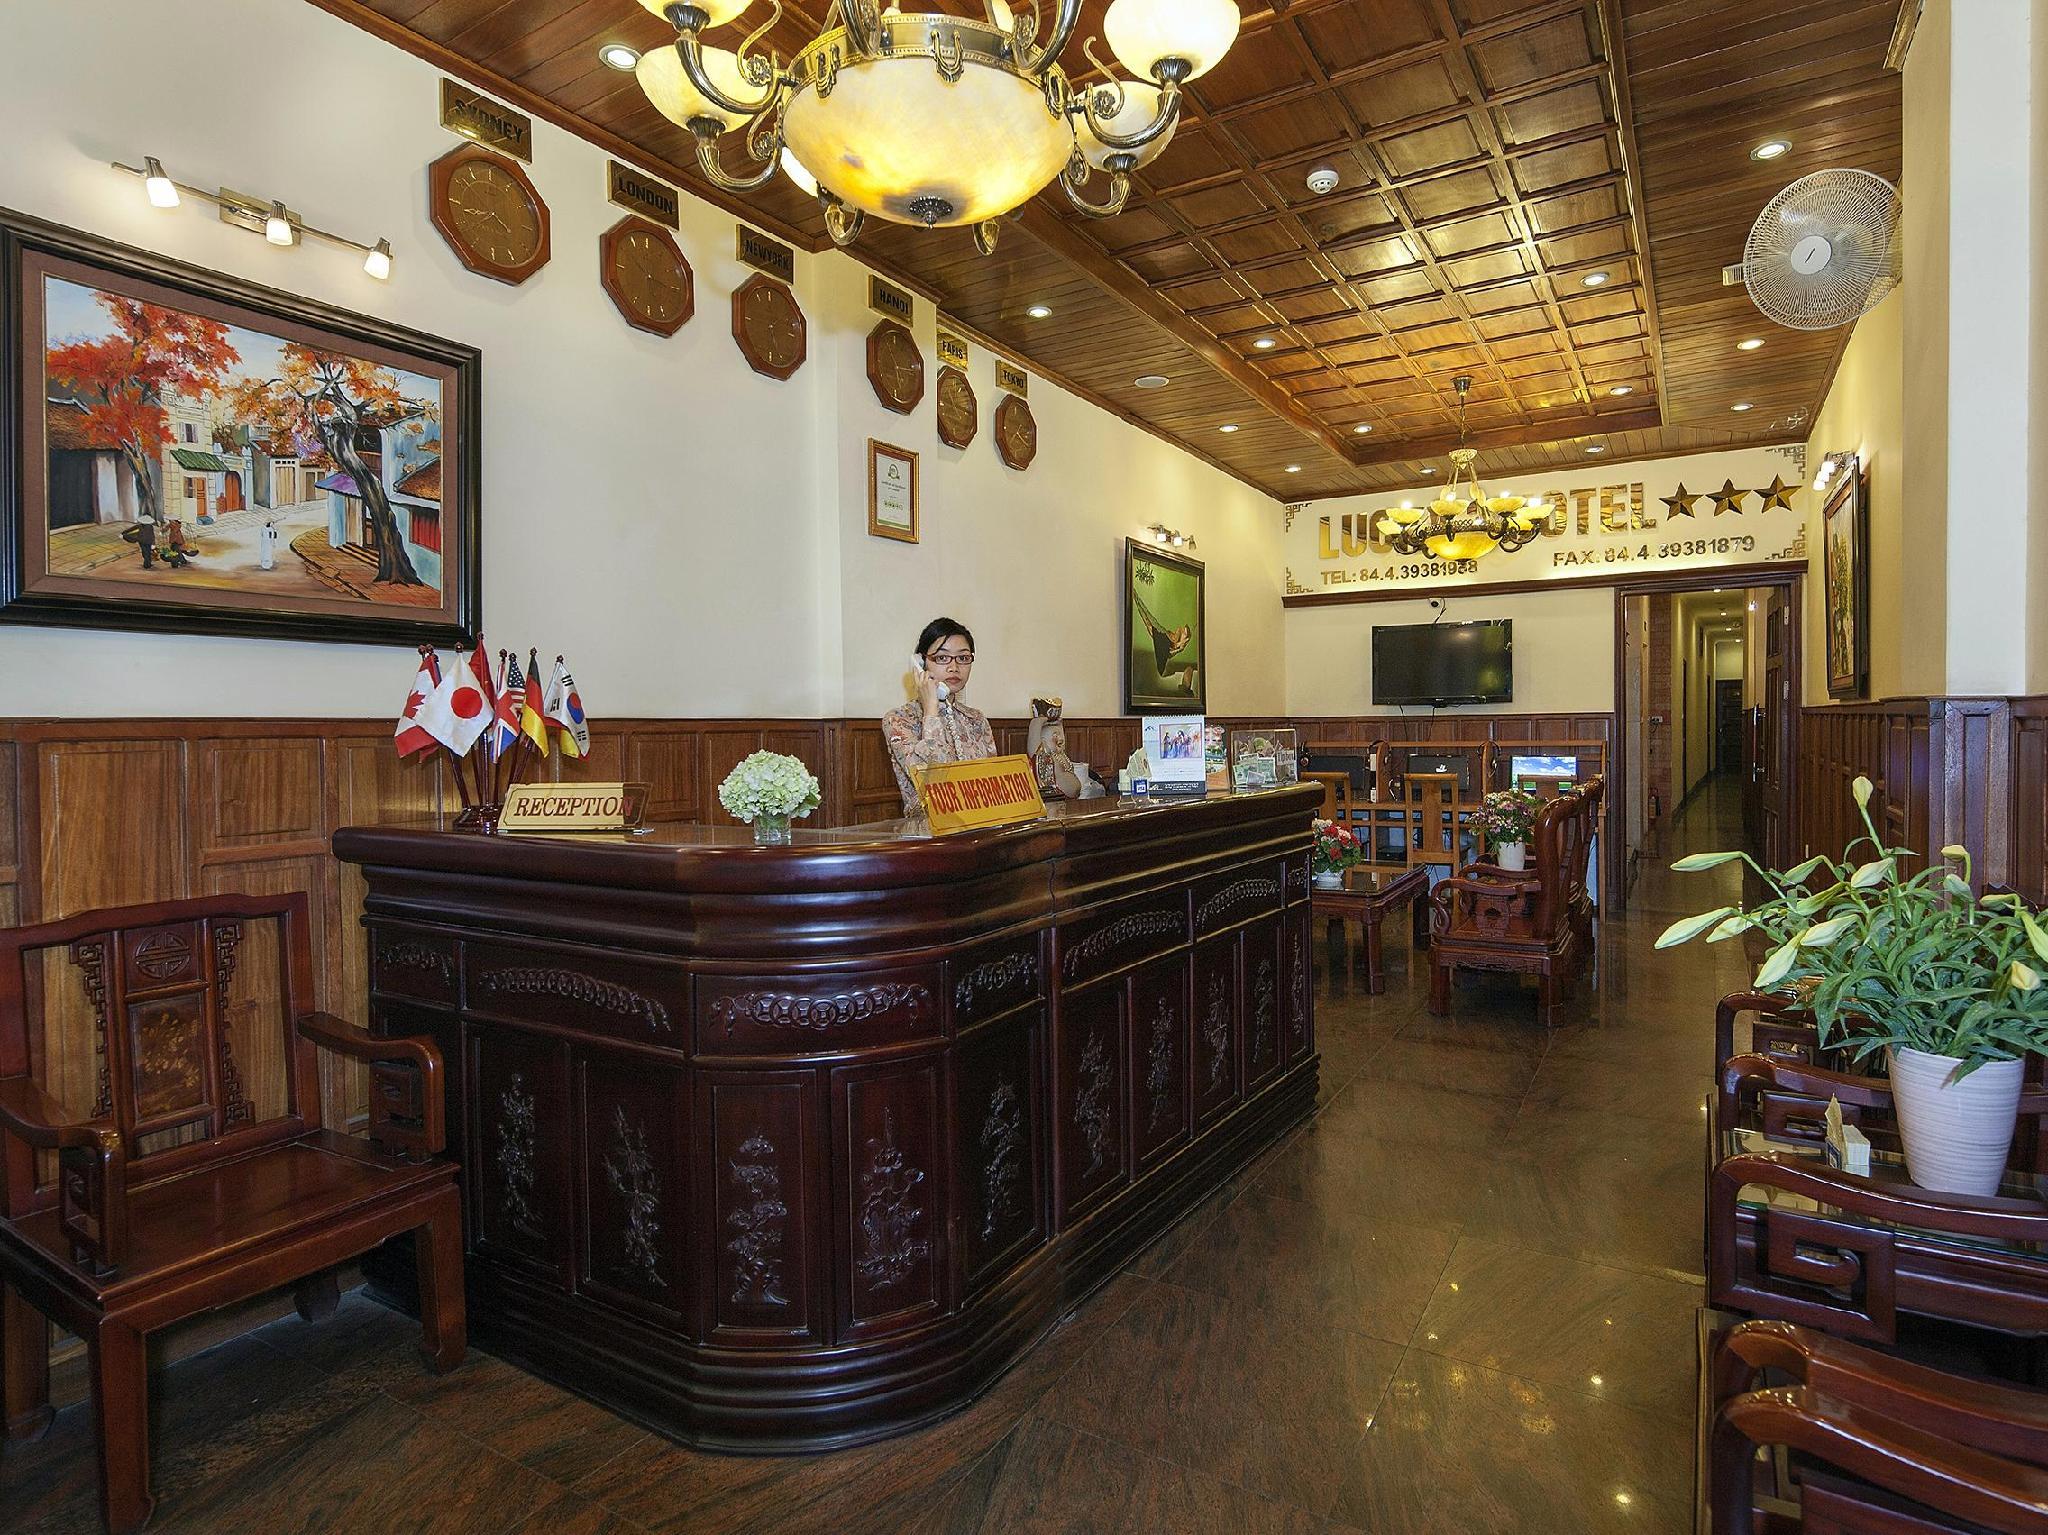 Lucky Hotel Hang Bong Street - Hotell och Boende i Vietnam , Hanoi